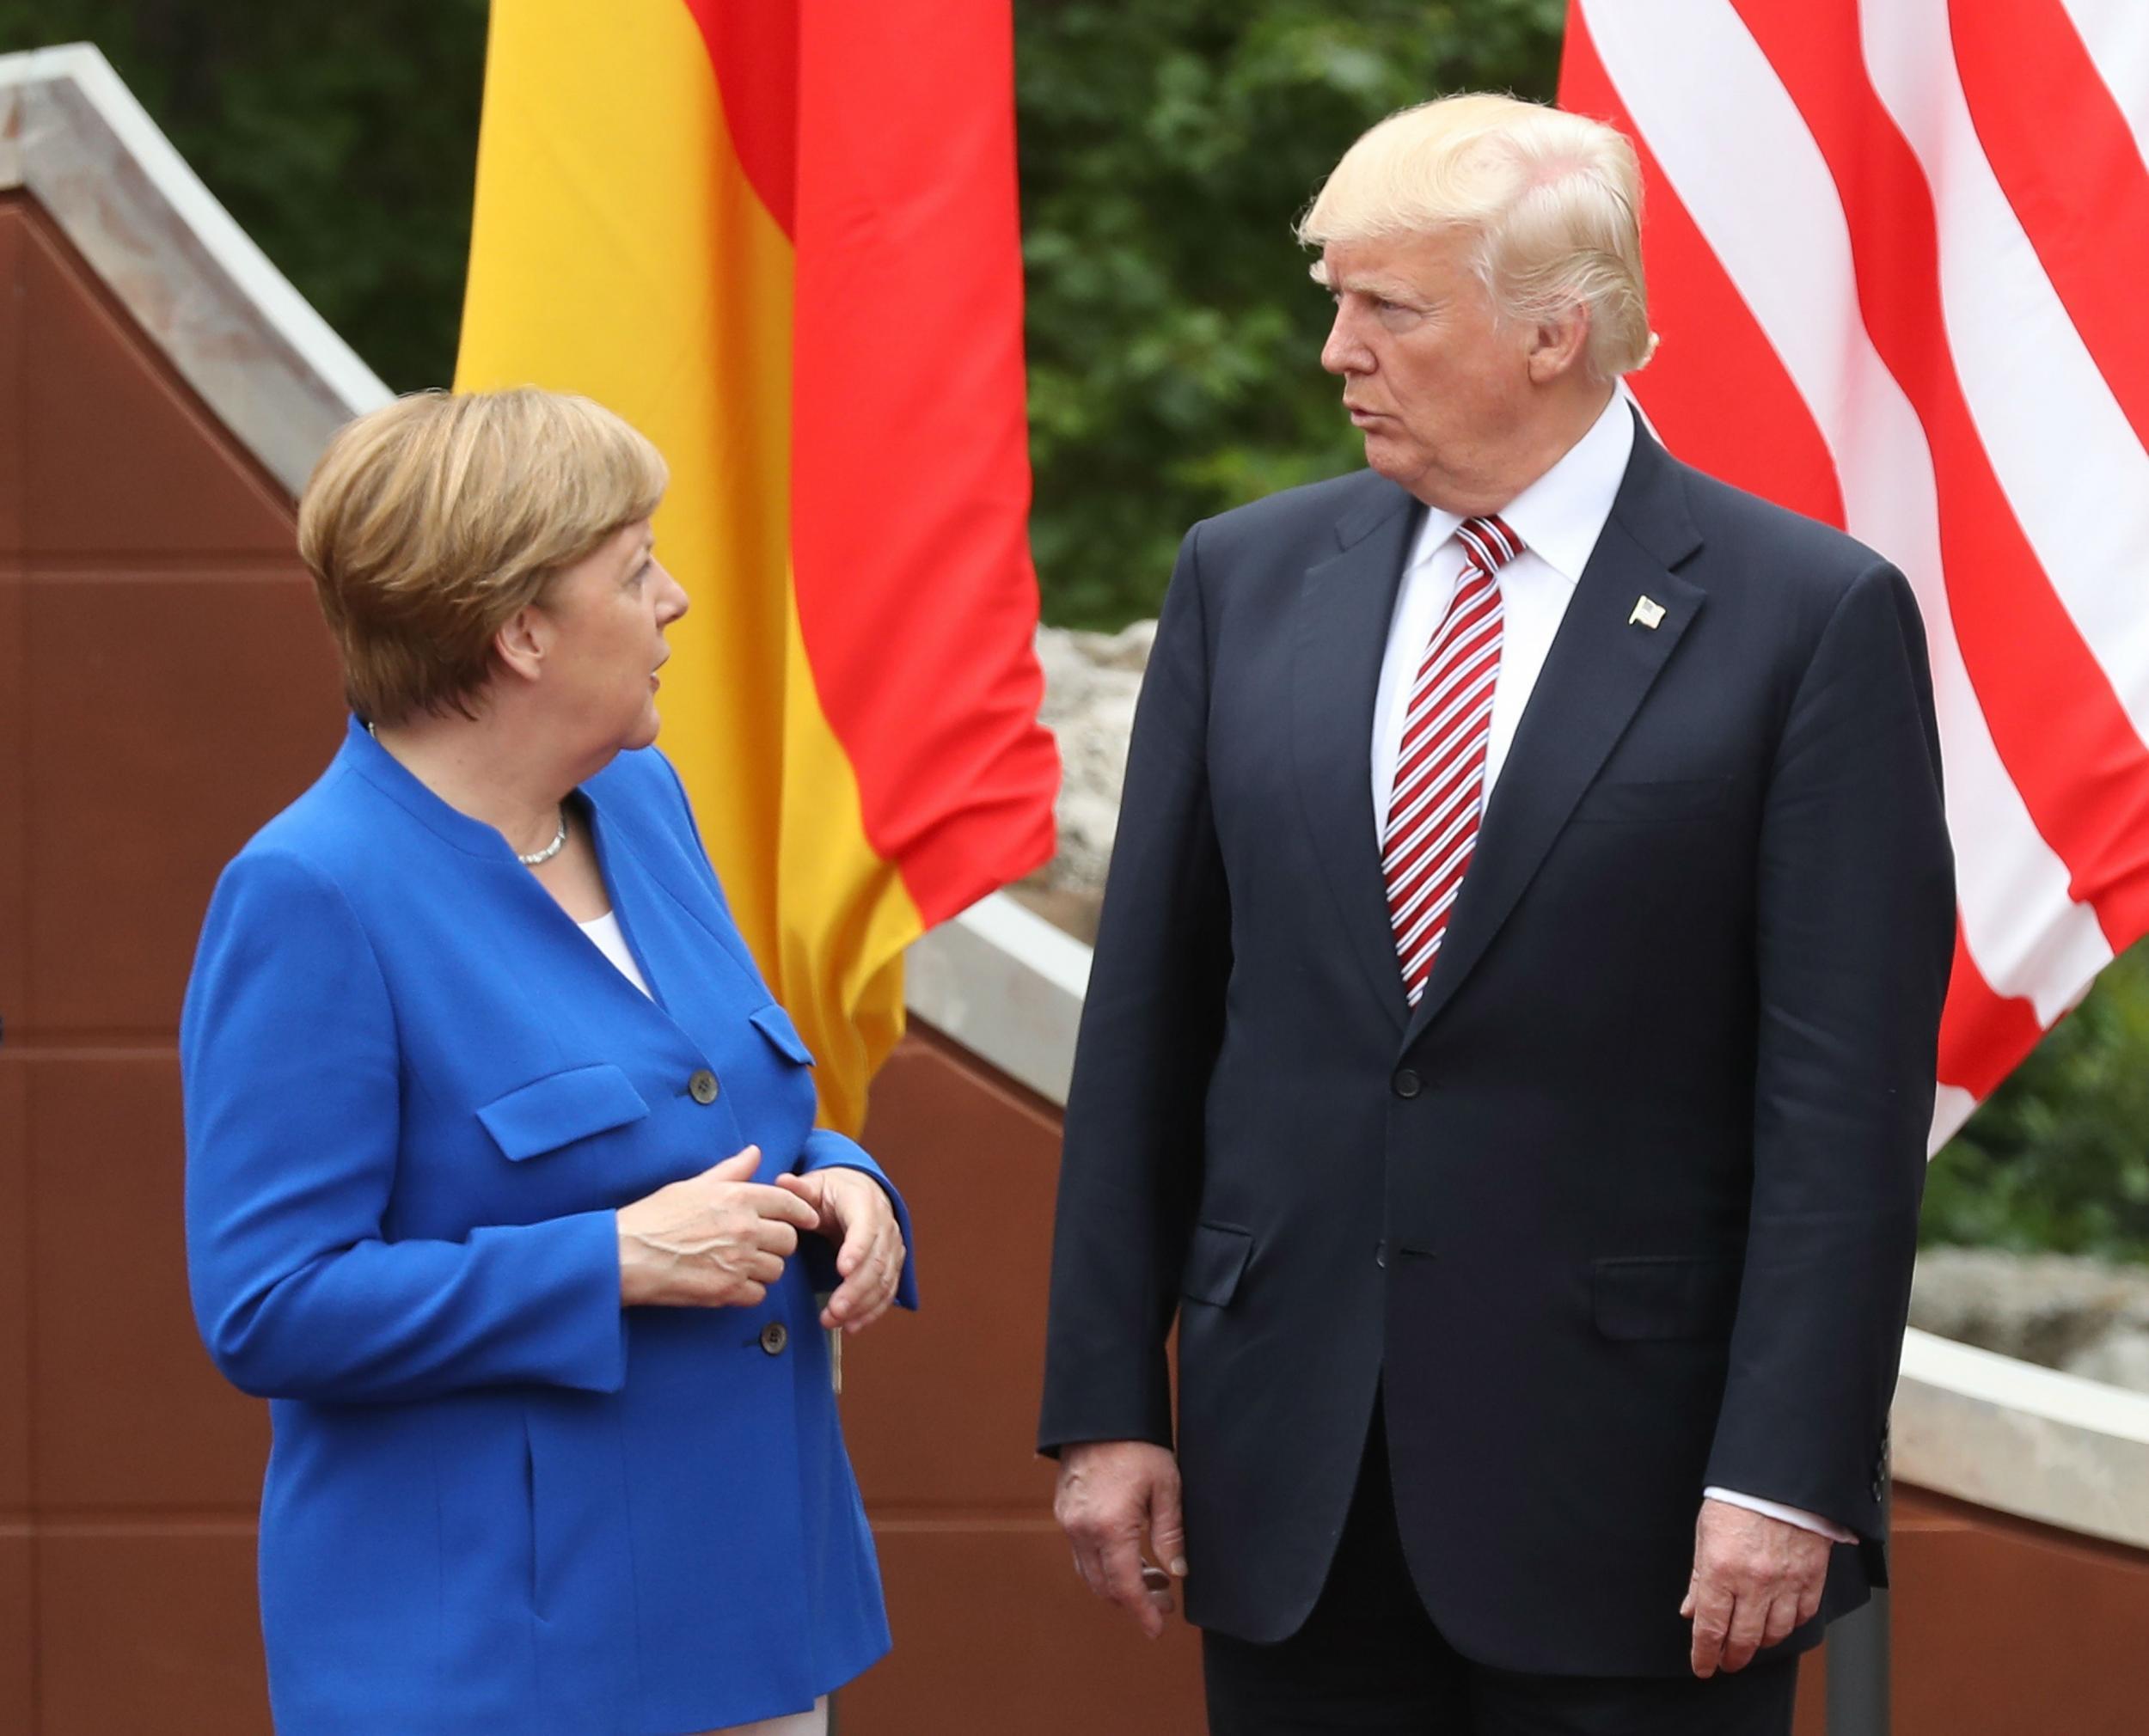 Angela Merkel no longer considers America a friend, election material reveals